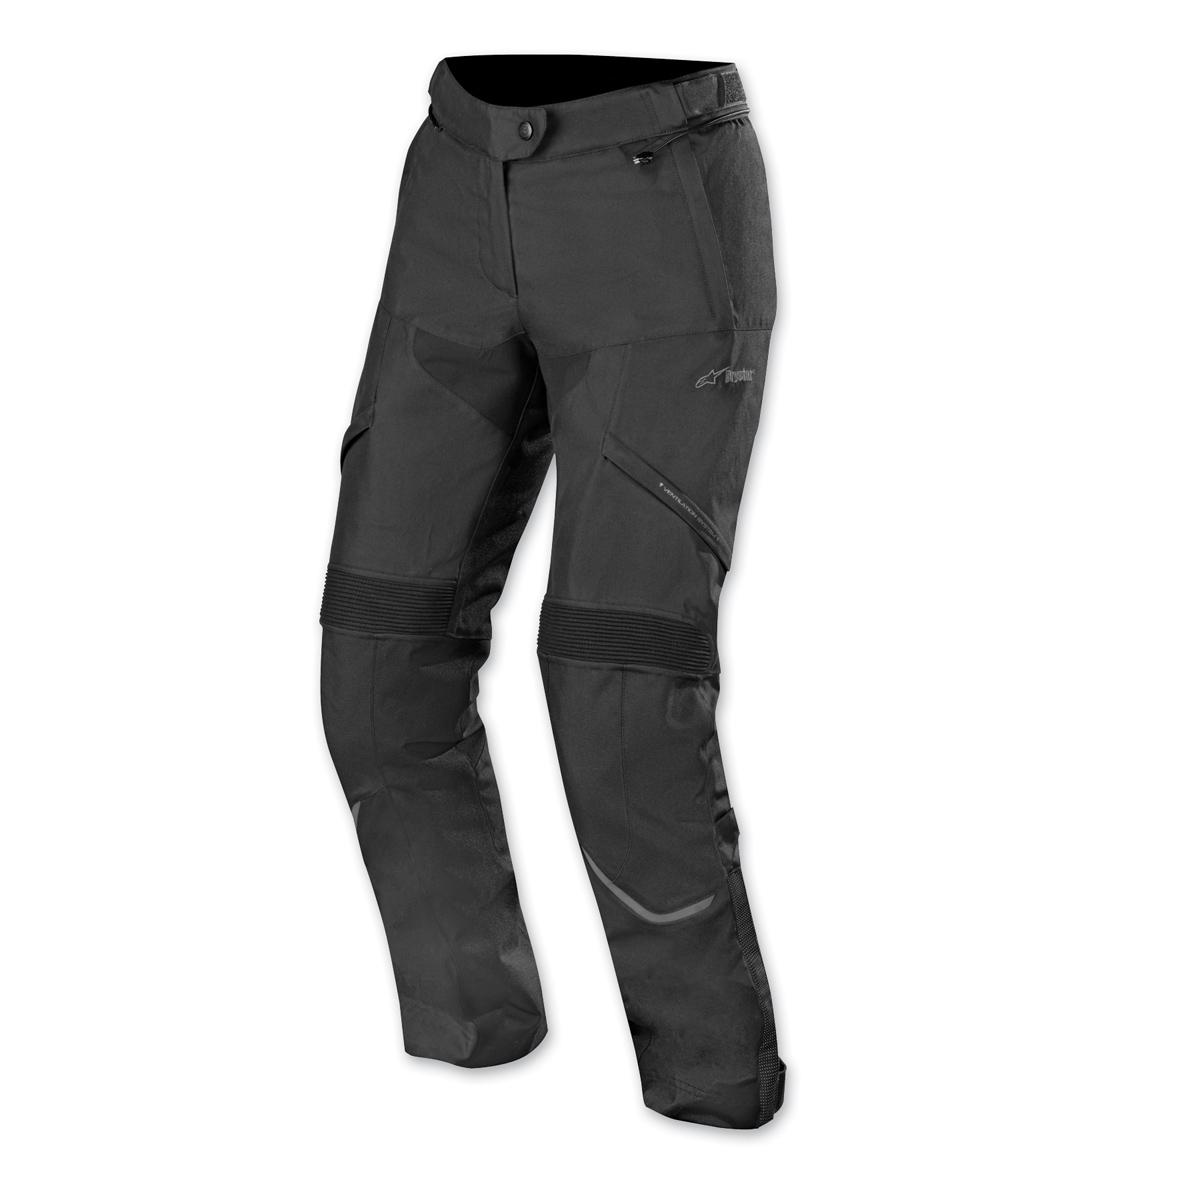 Alpinestars Women's Stella Hyper Drystar Black Pants